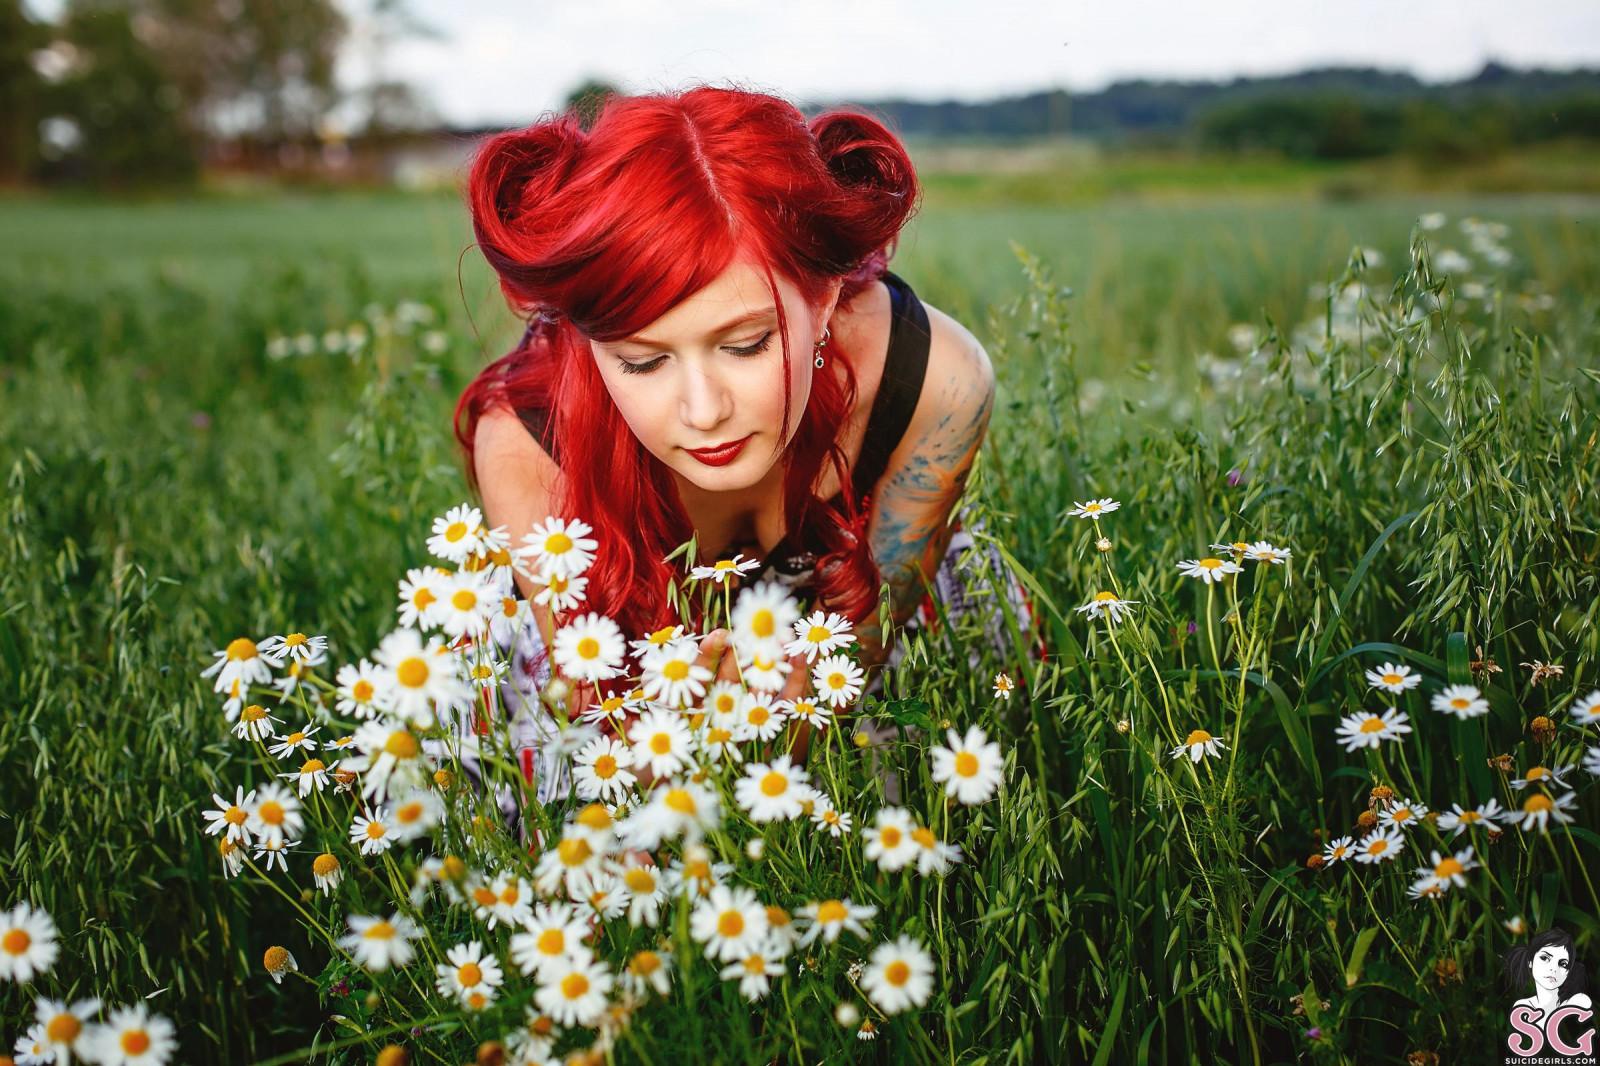 #4526215 #Janesinner Suicide, #redhead, #Yana Sinner, #